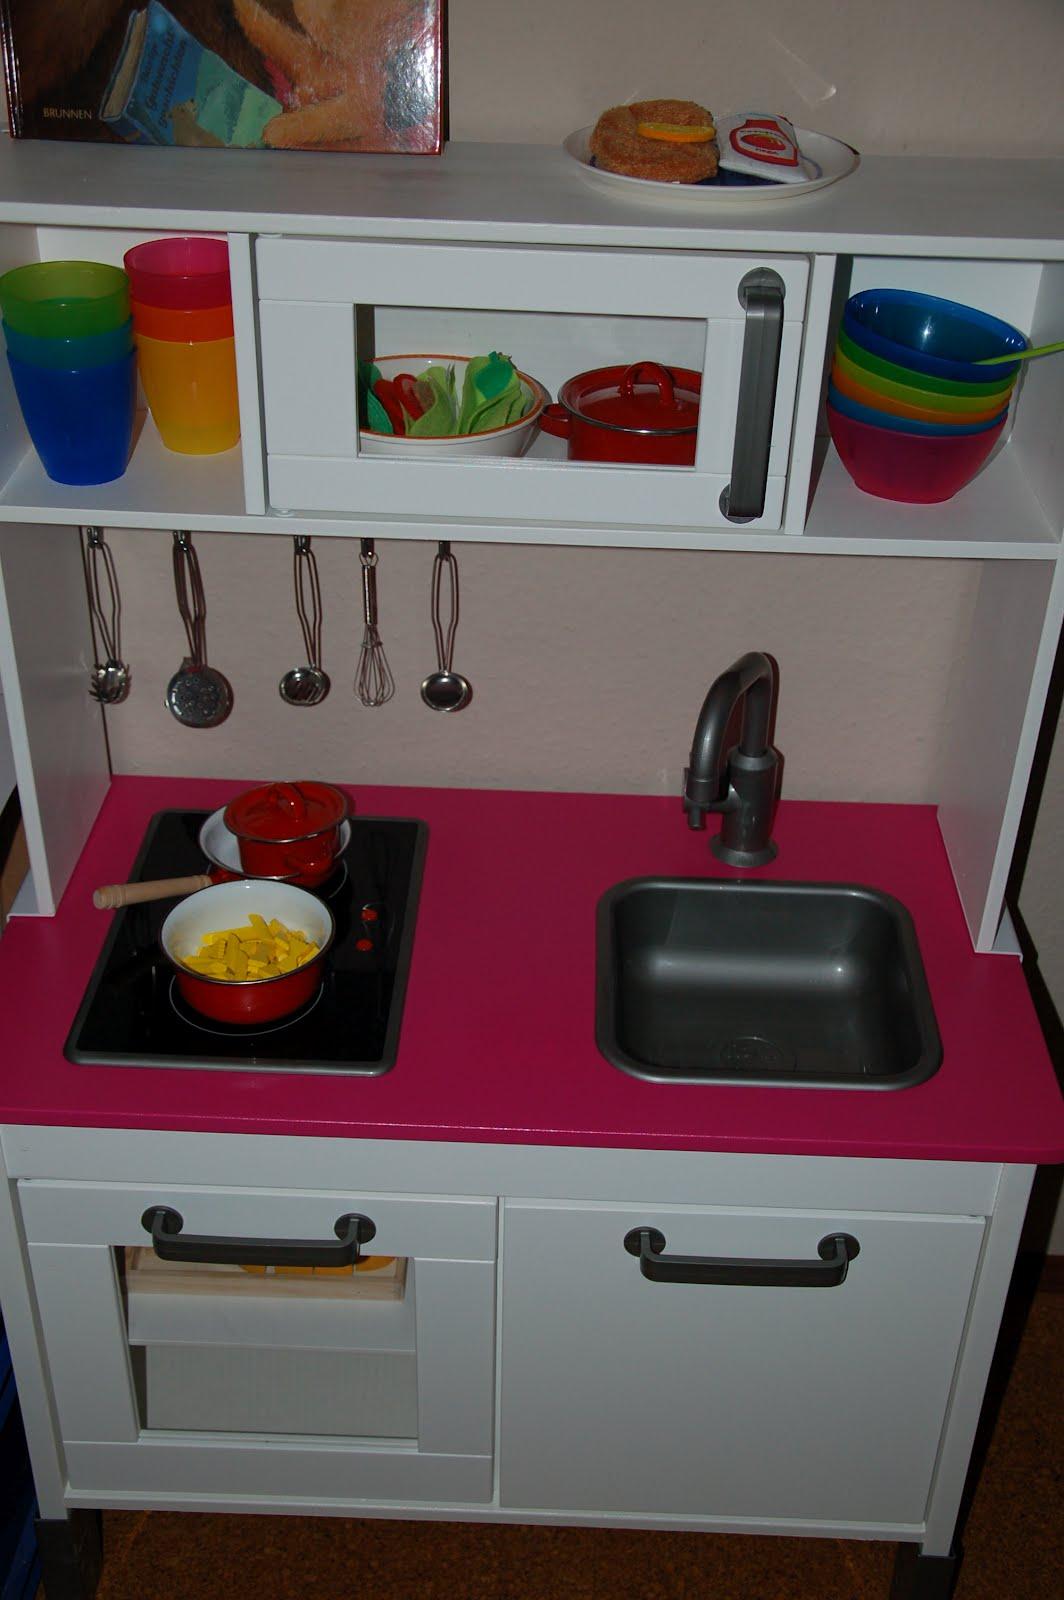 nadelia ikea kinderk che goes white pink. Black Bedroom Furniture Sets. Home Design Ideas